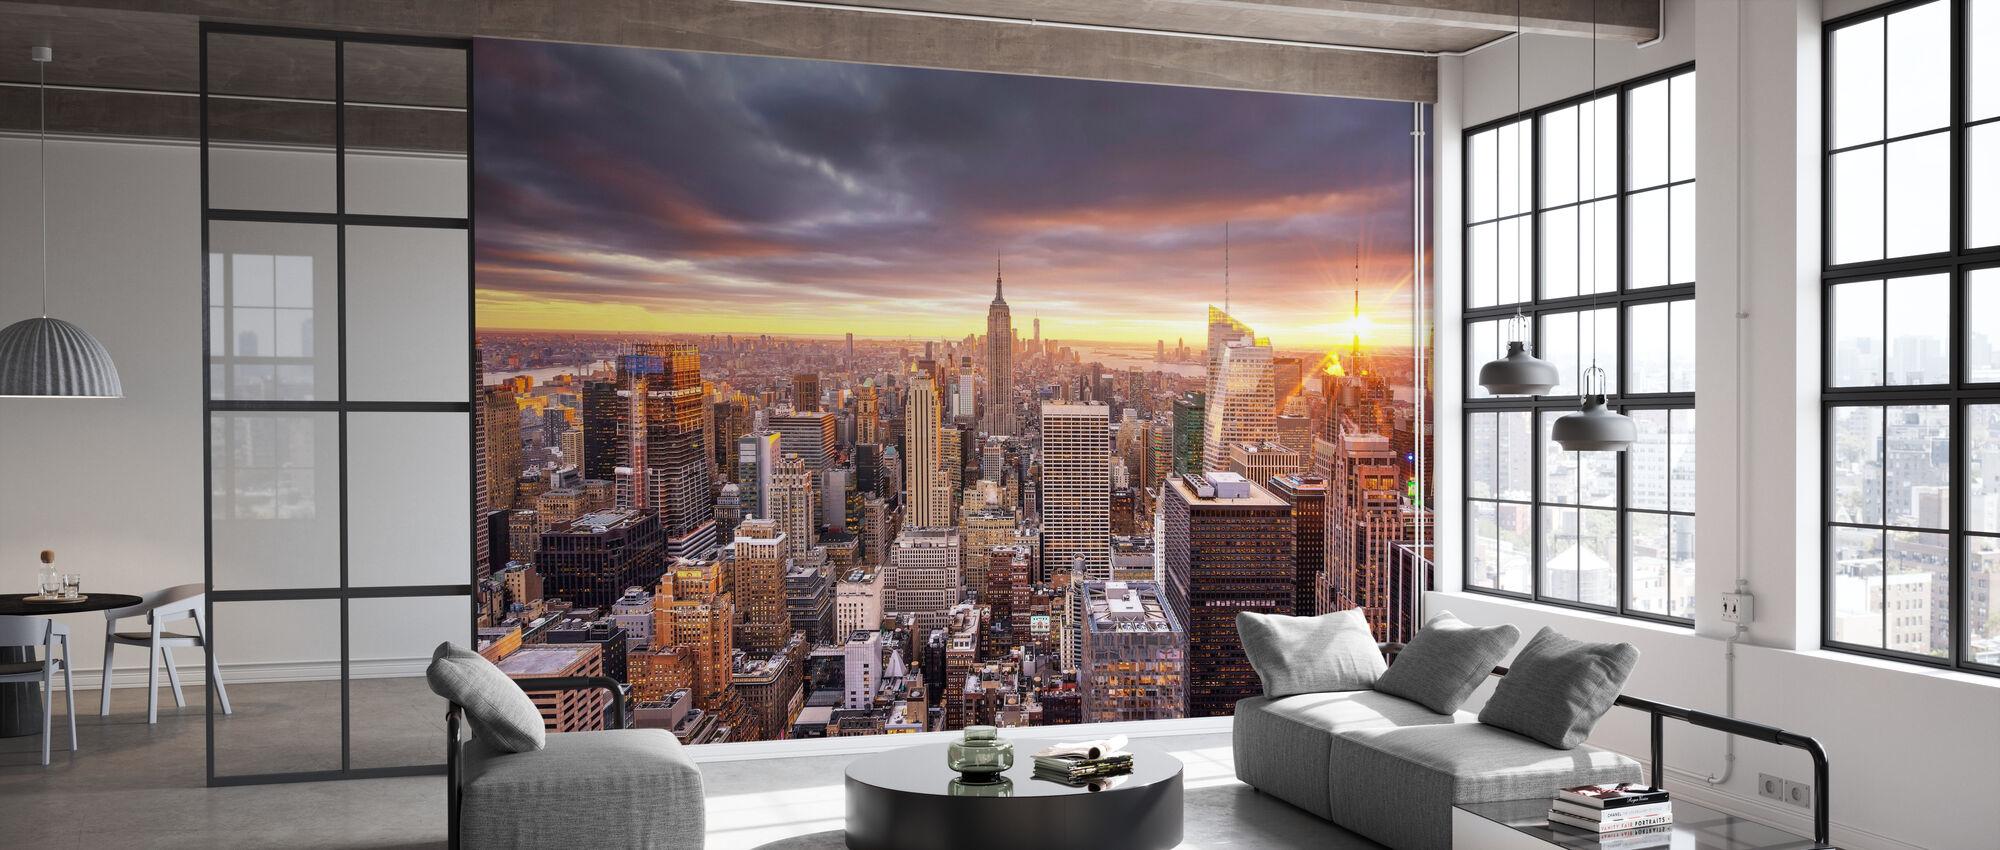 Top - Wallpaper - Office